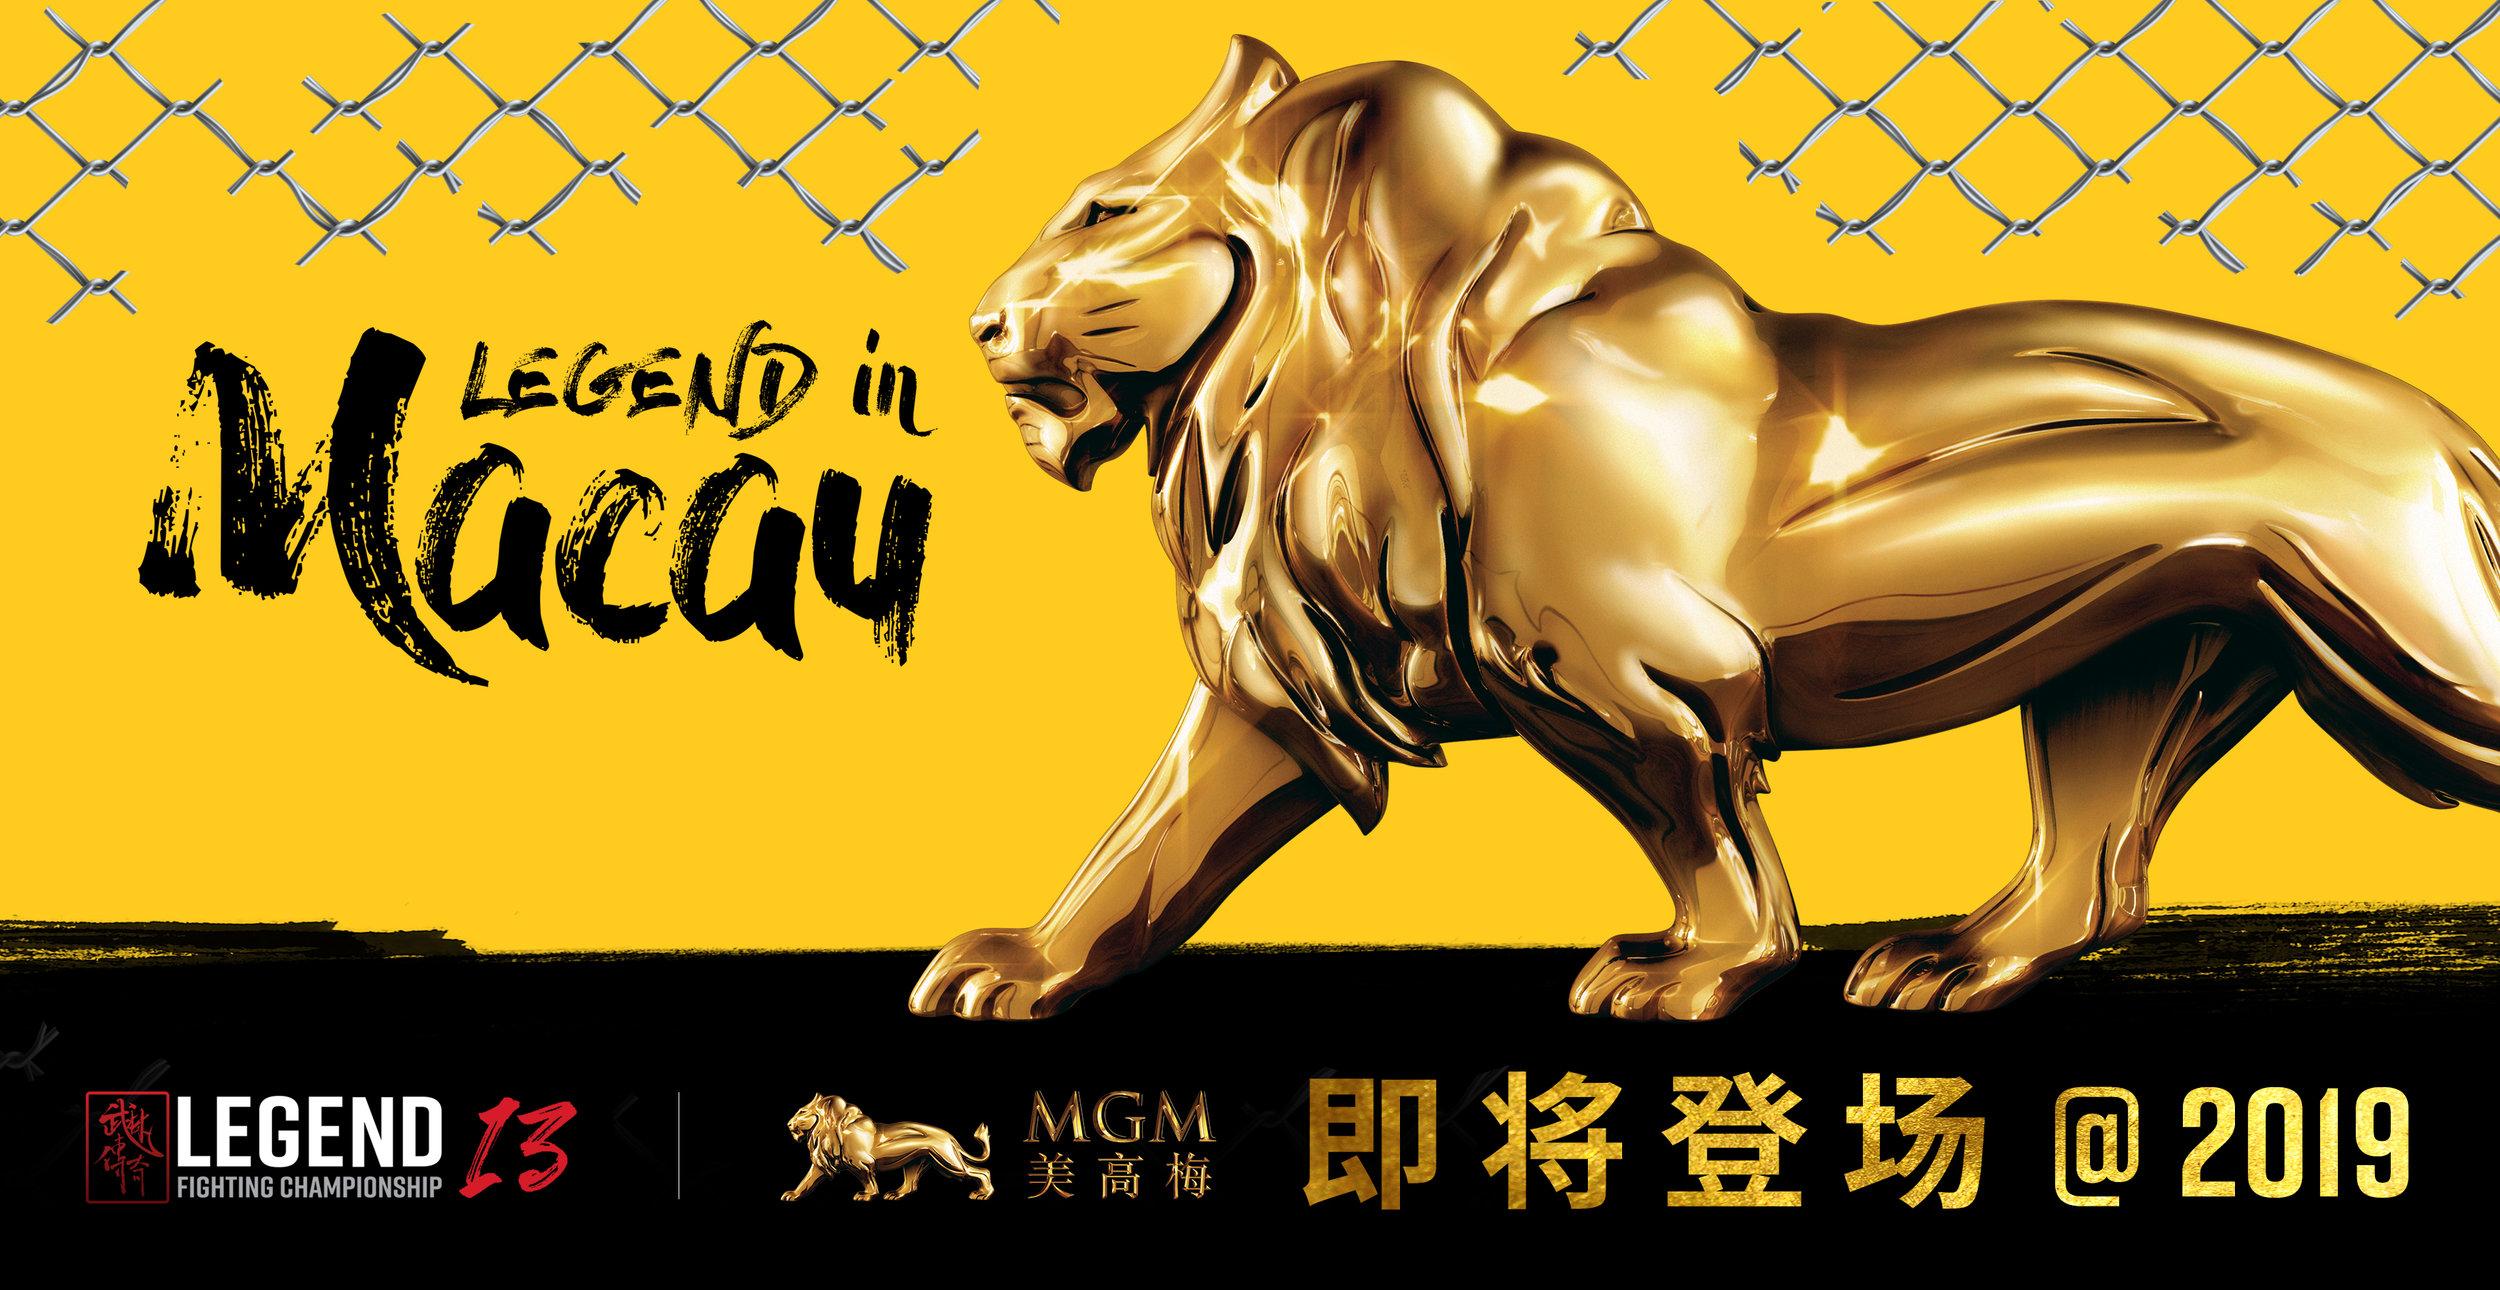 LFC13TEASER_WEB_banner_CHN.jpg